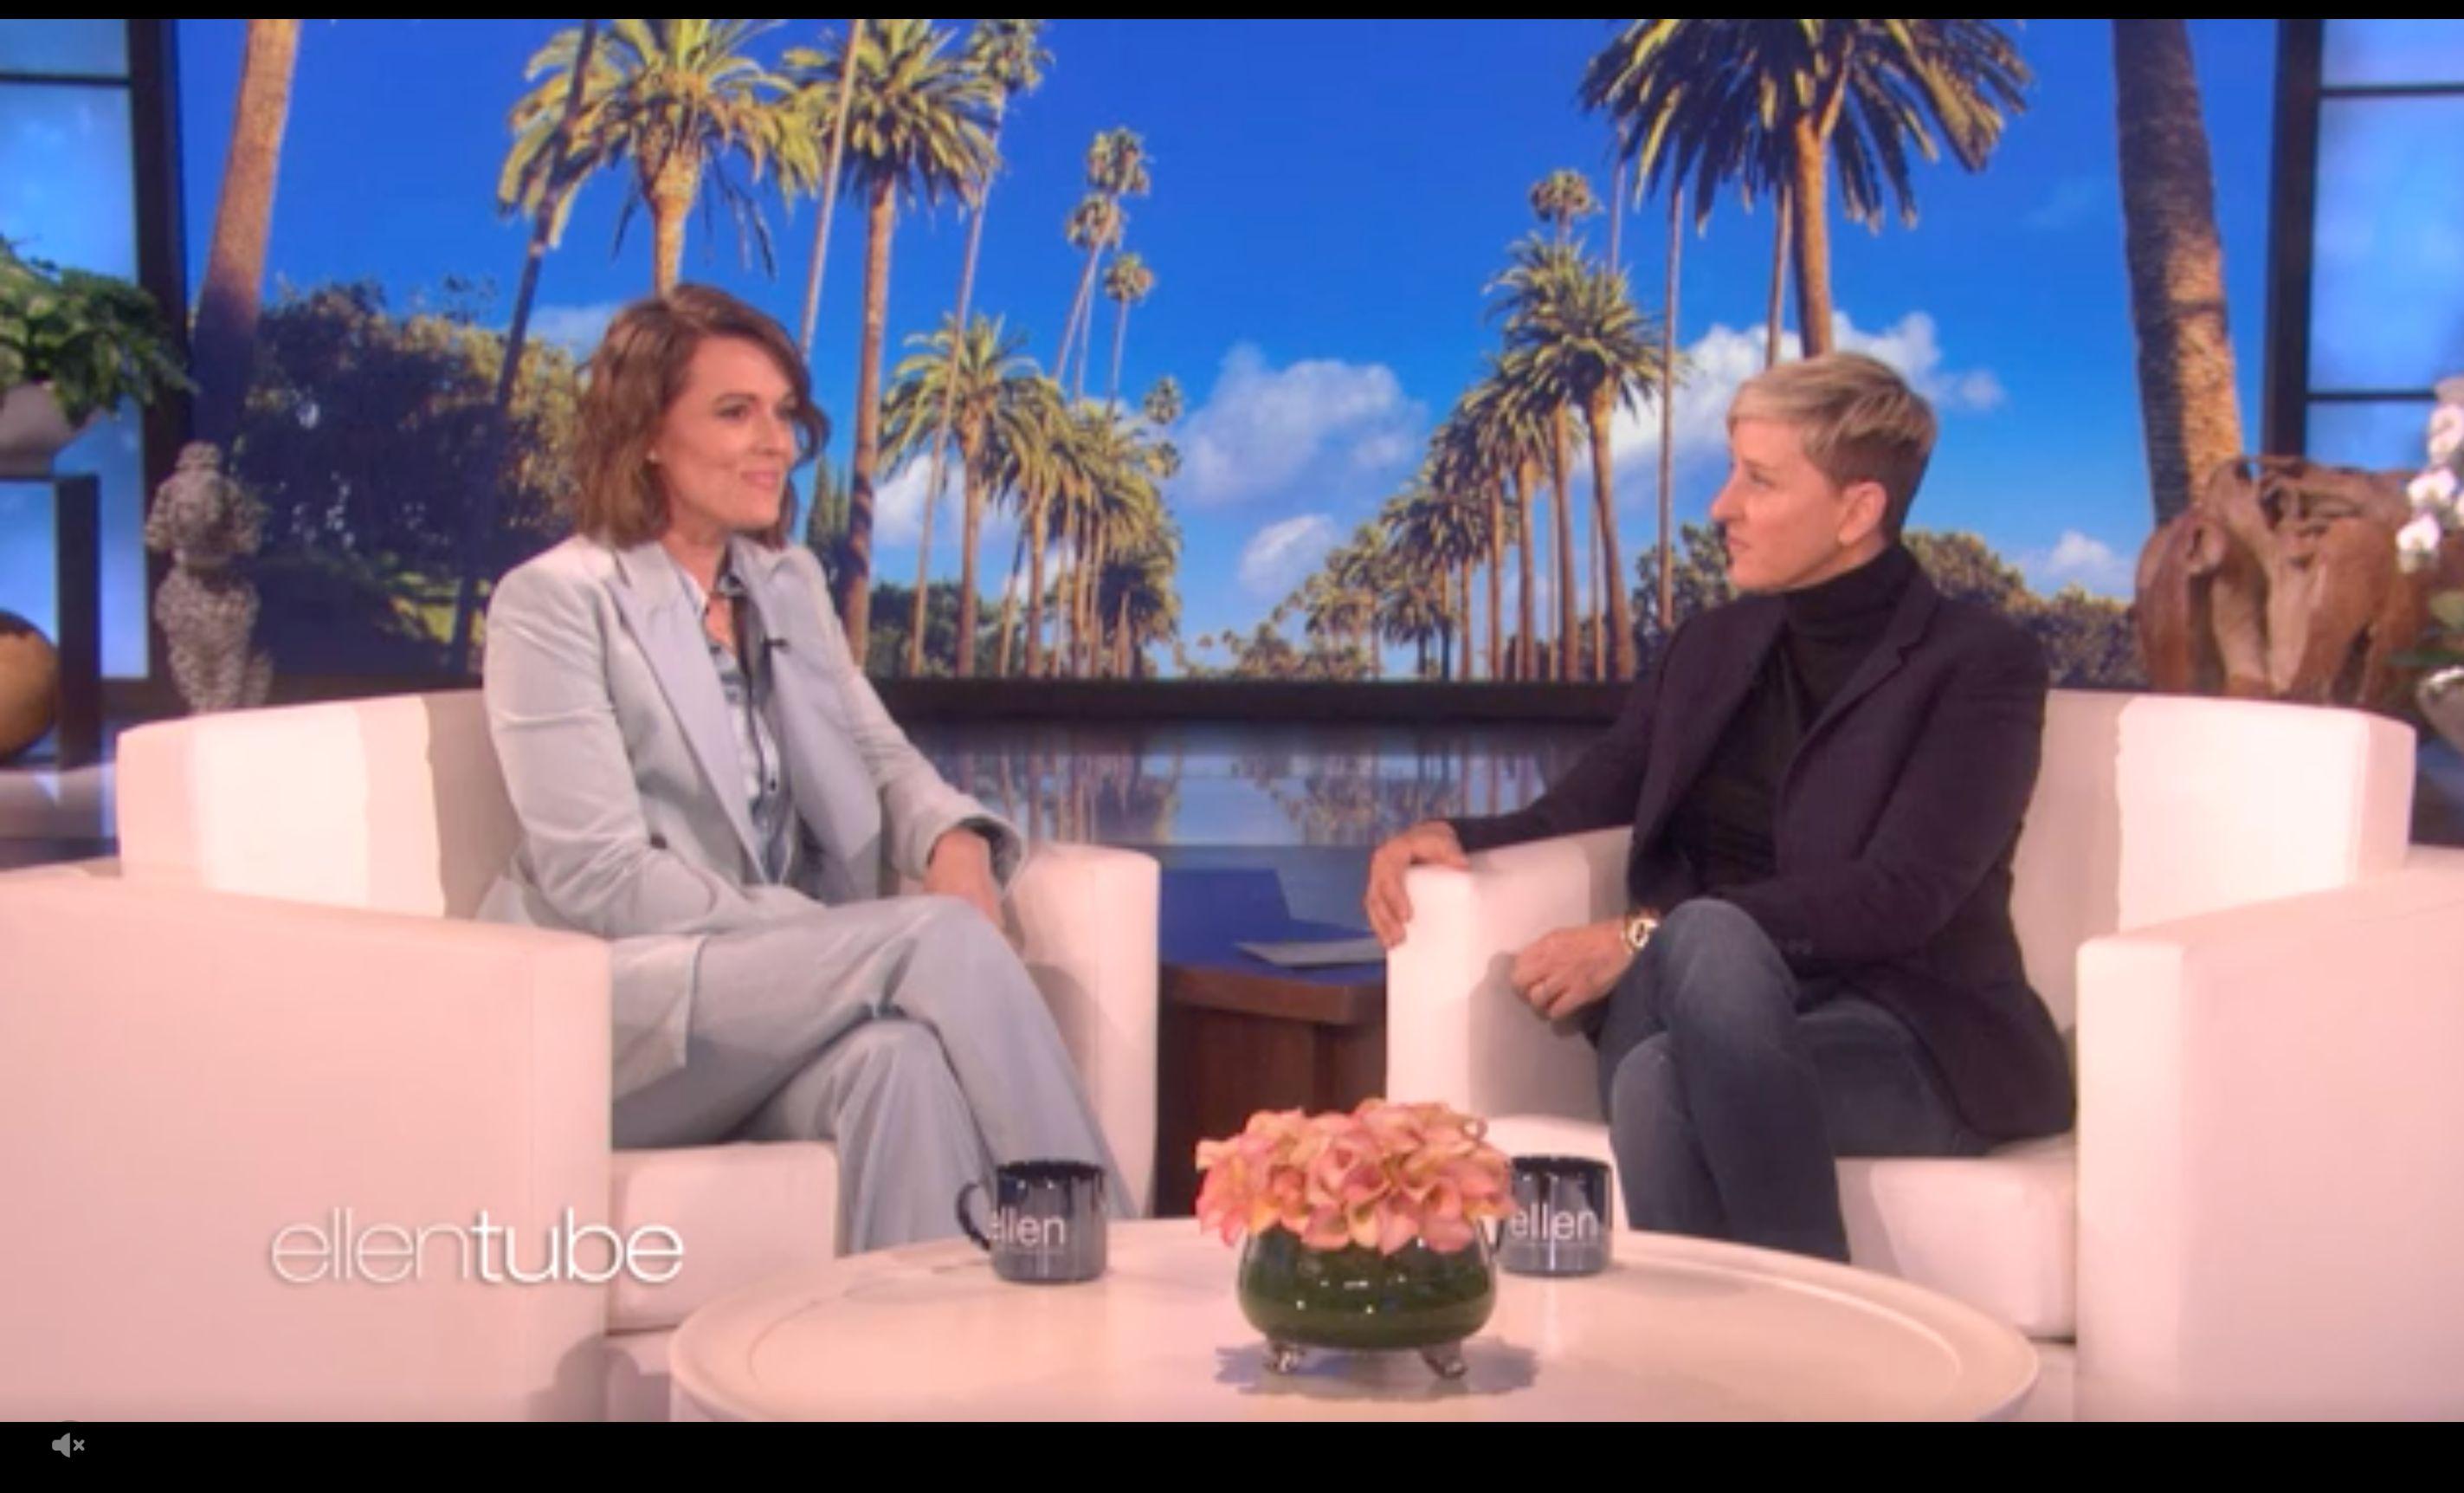 Brandi Carlile Credits Ellen DeGeneres With Inspiring Her To Come